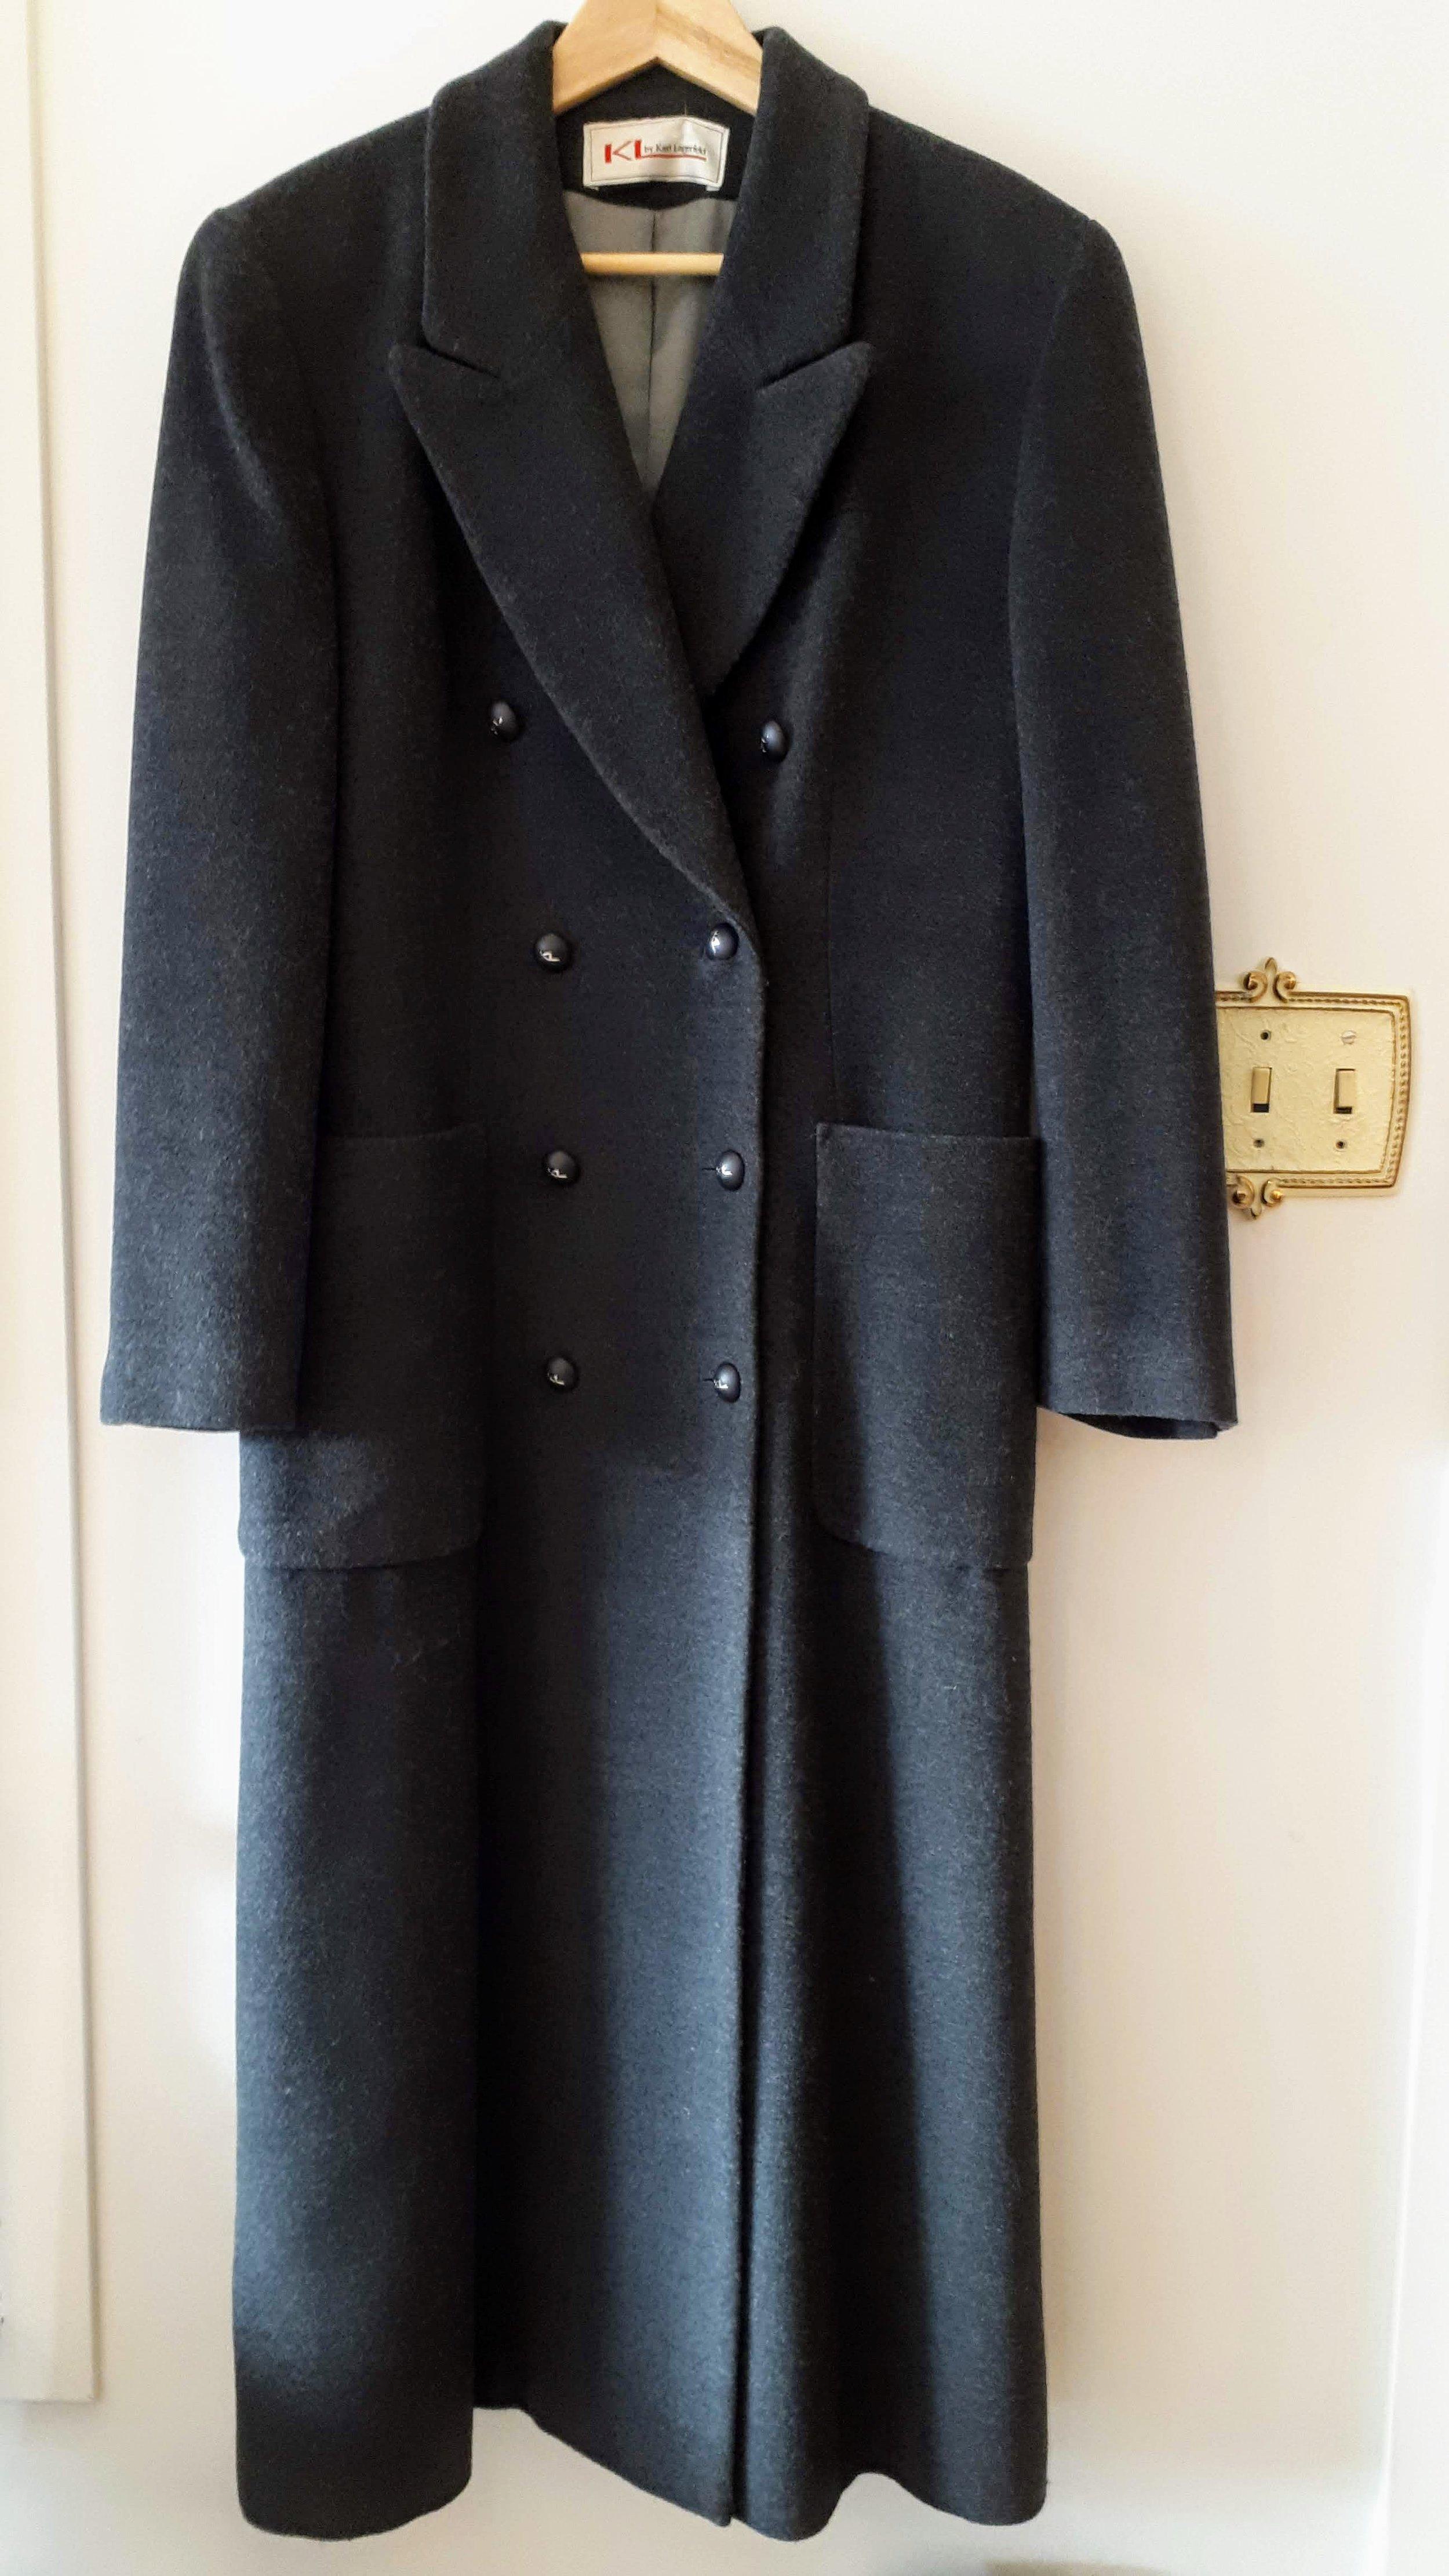 Karl Lagerfeld coat; Size S, $125